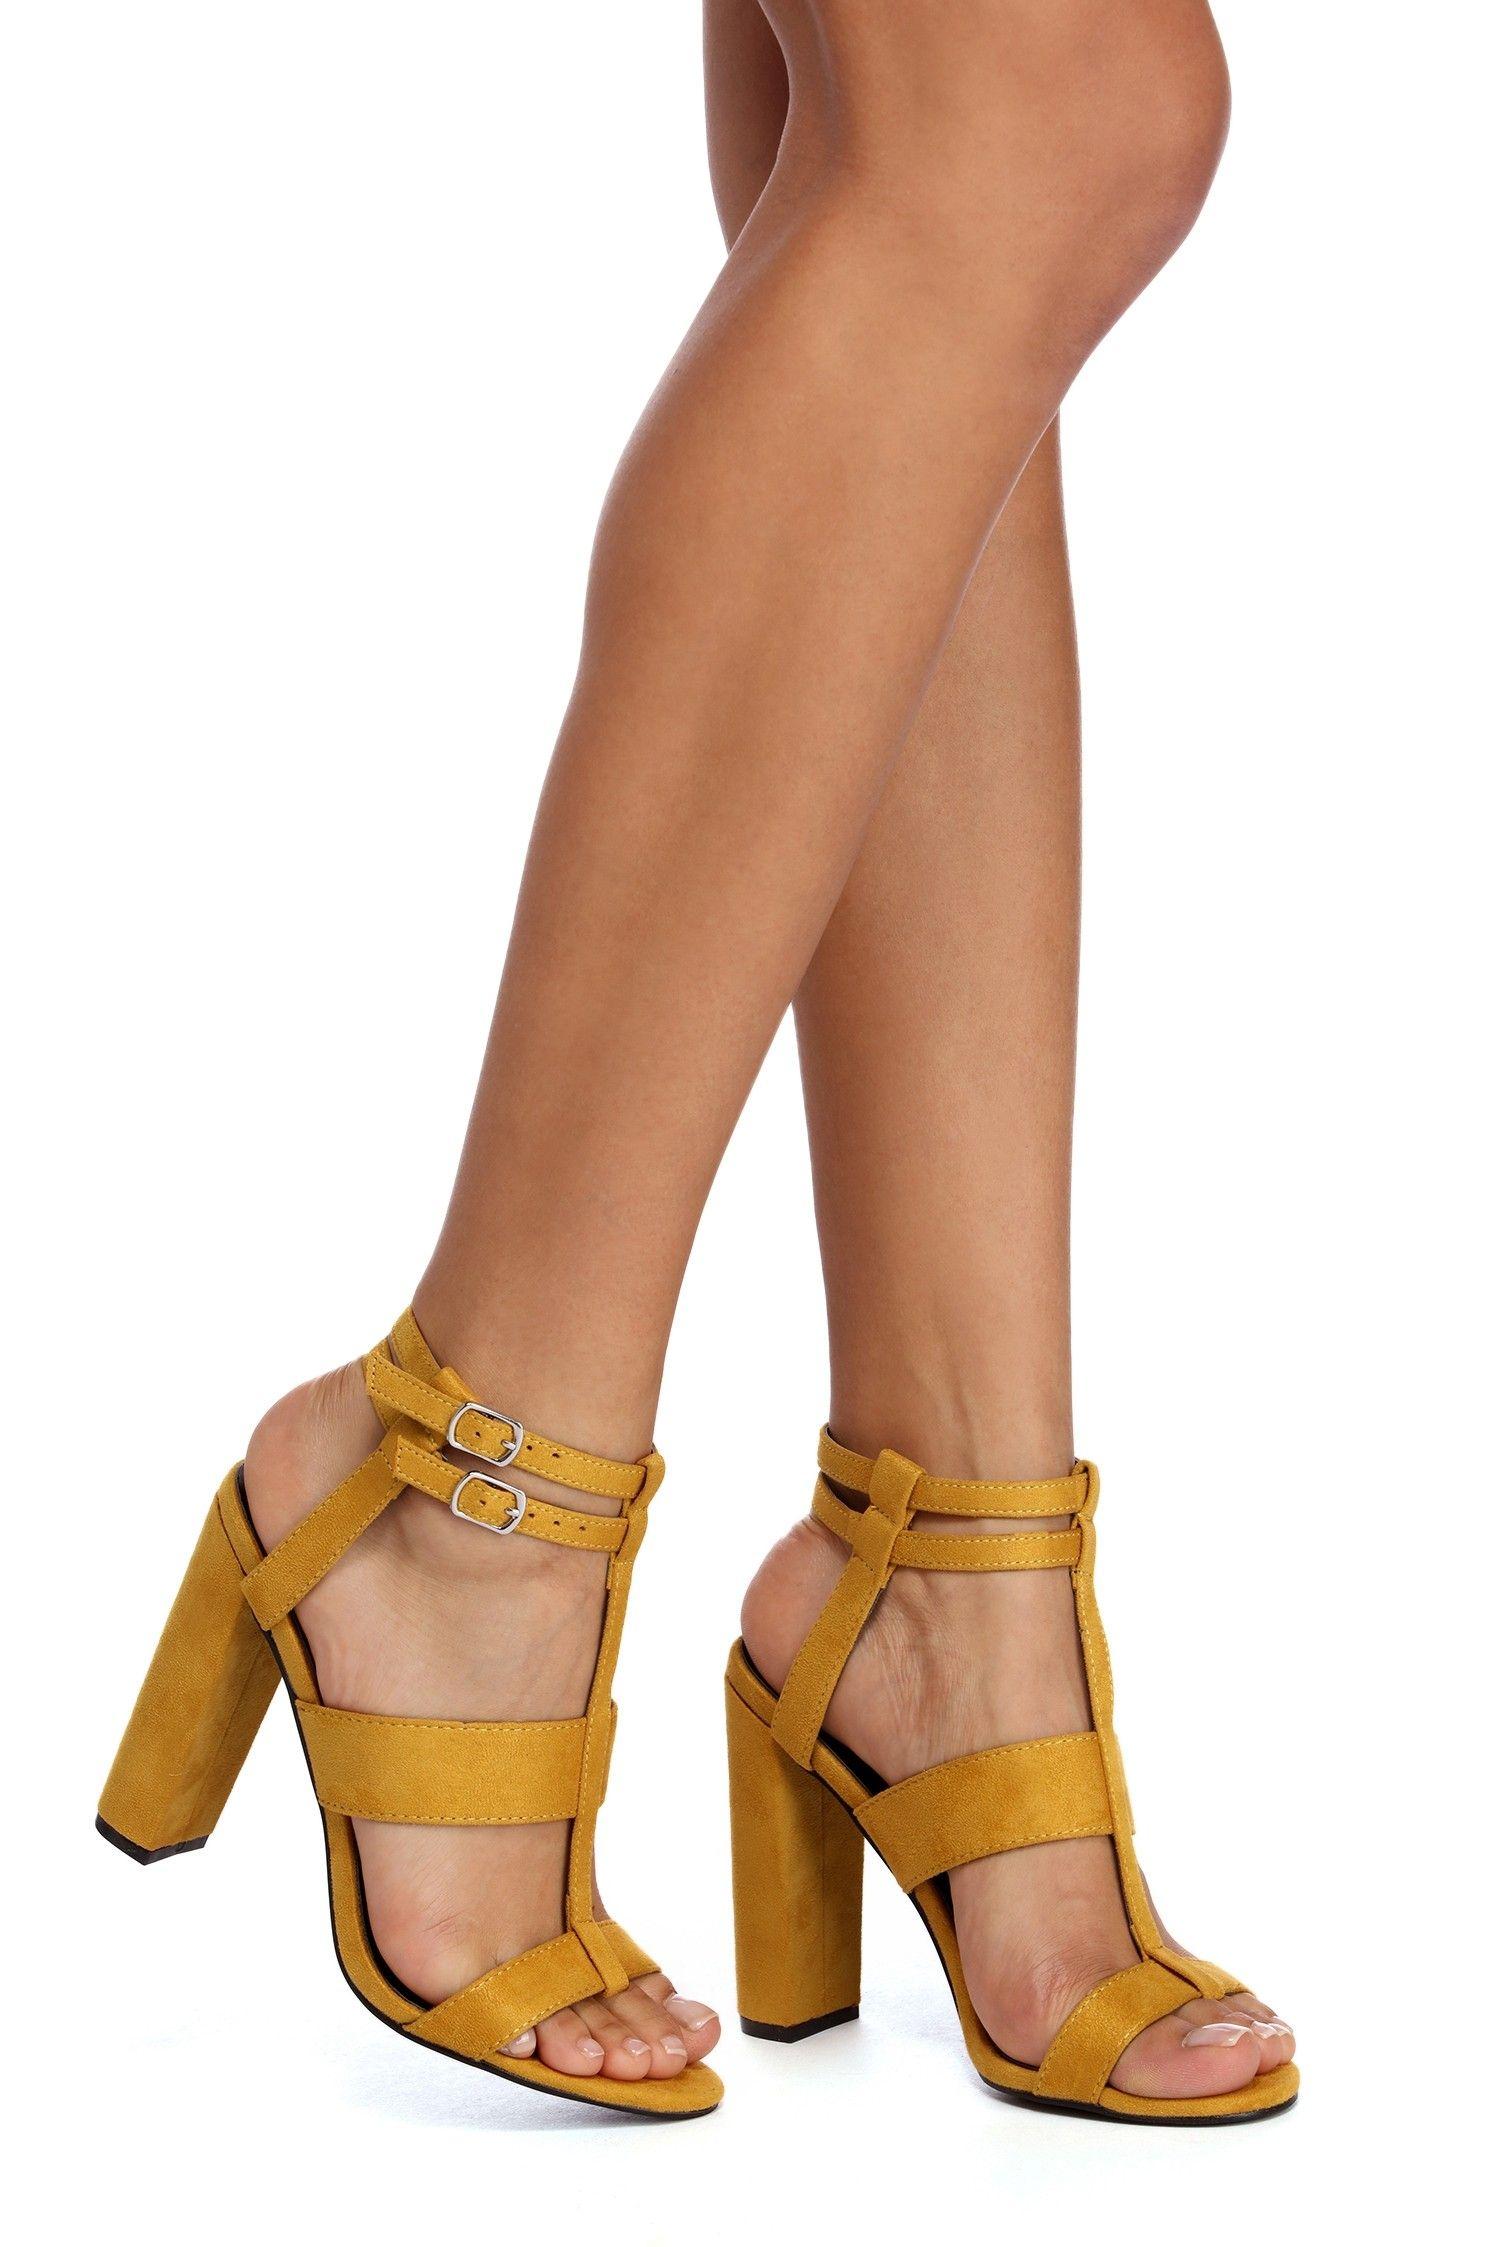 42f9b075a0e5d Buckled Beauty Block Heels in 2019   Shoes   Heels, Block heels ...